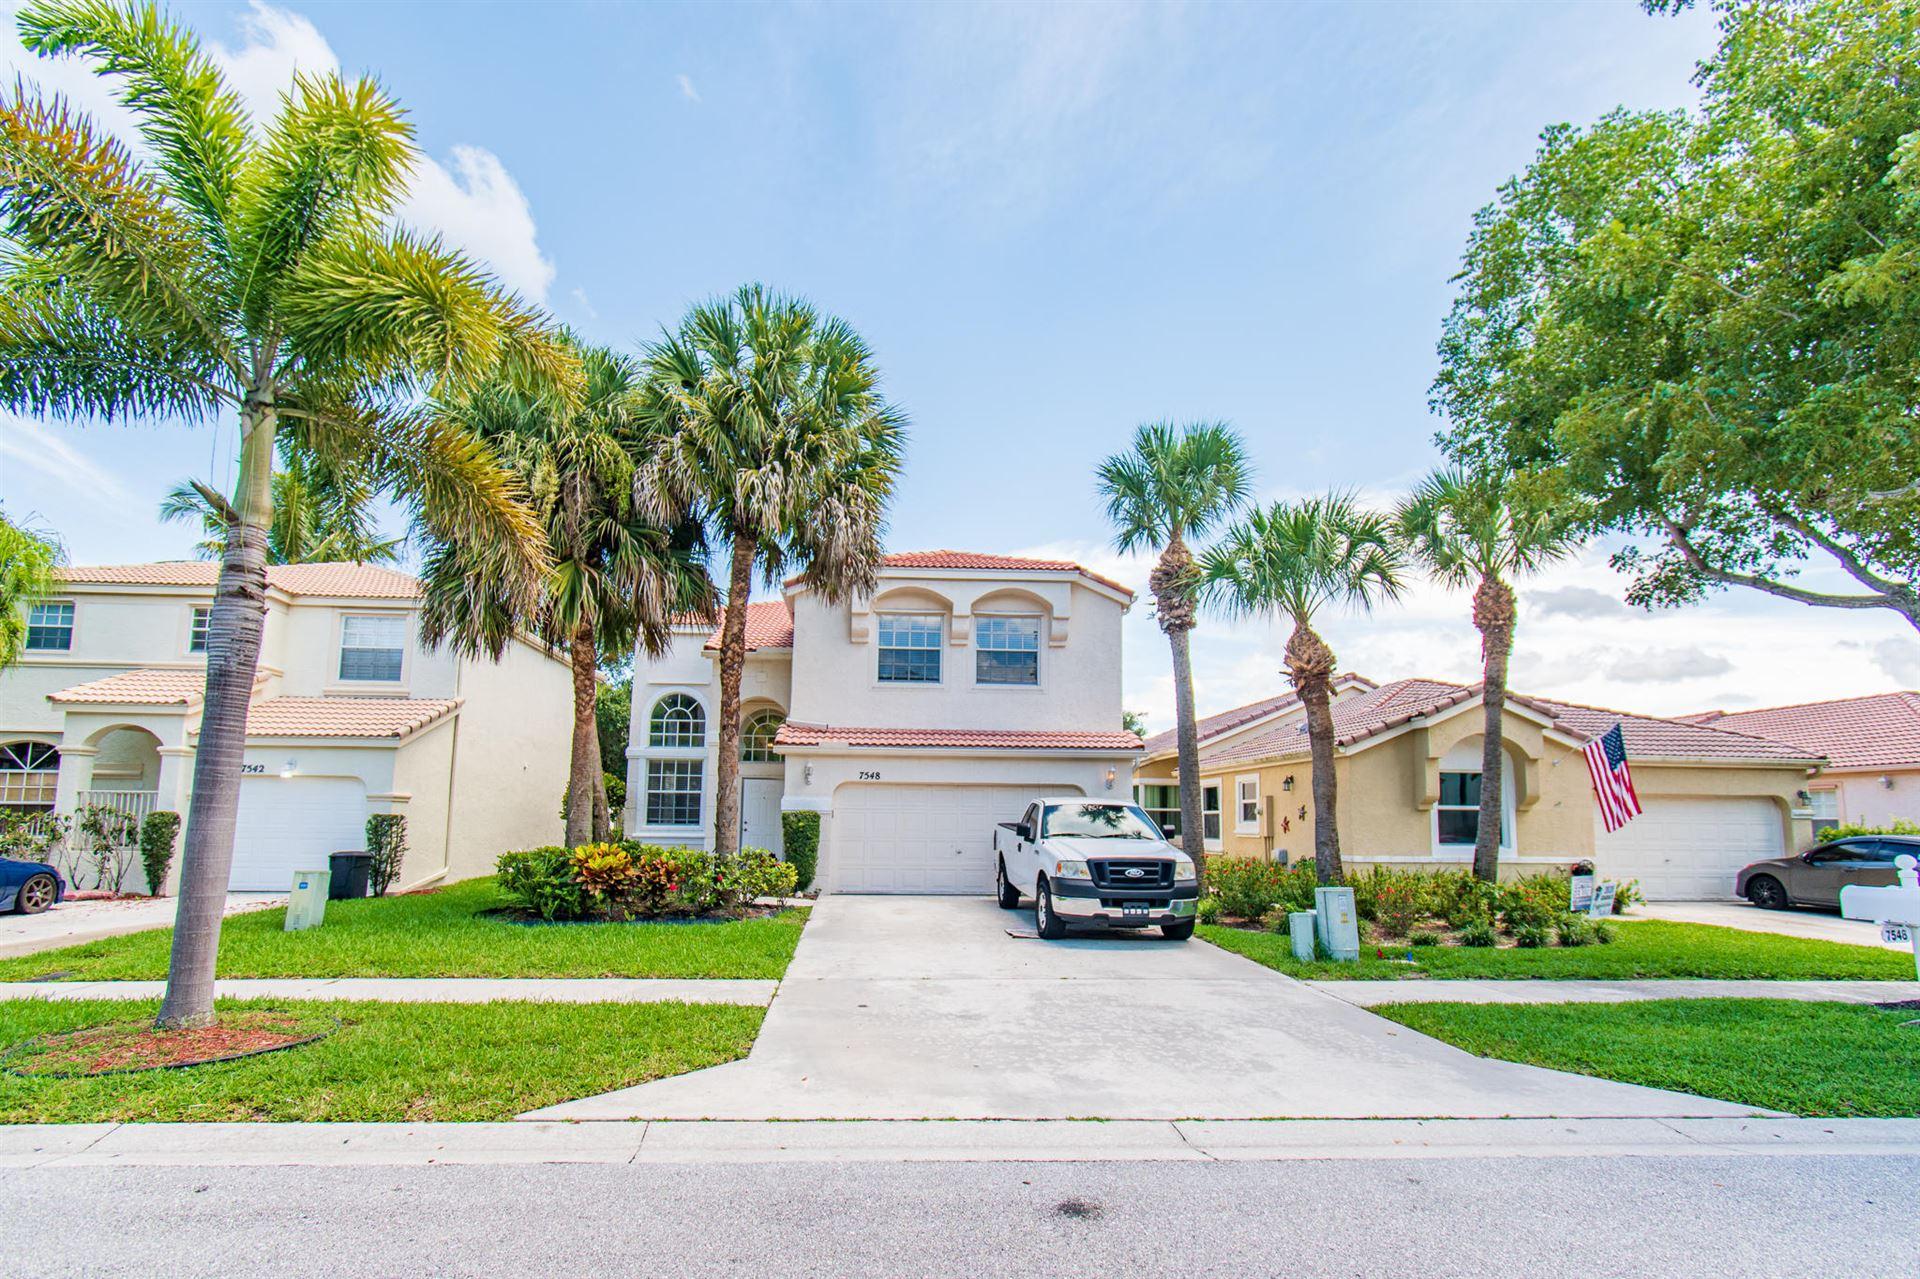 7548 Kingsley Court, Lake Worth, FL 33467 - #: RX-10634809